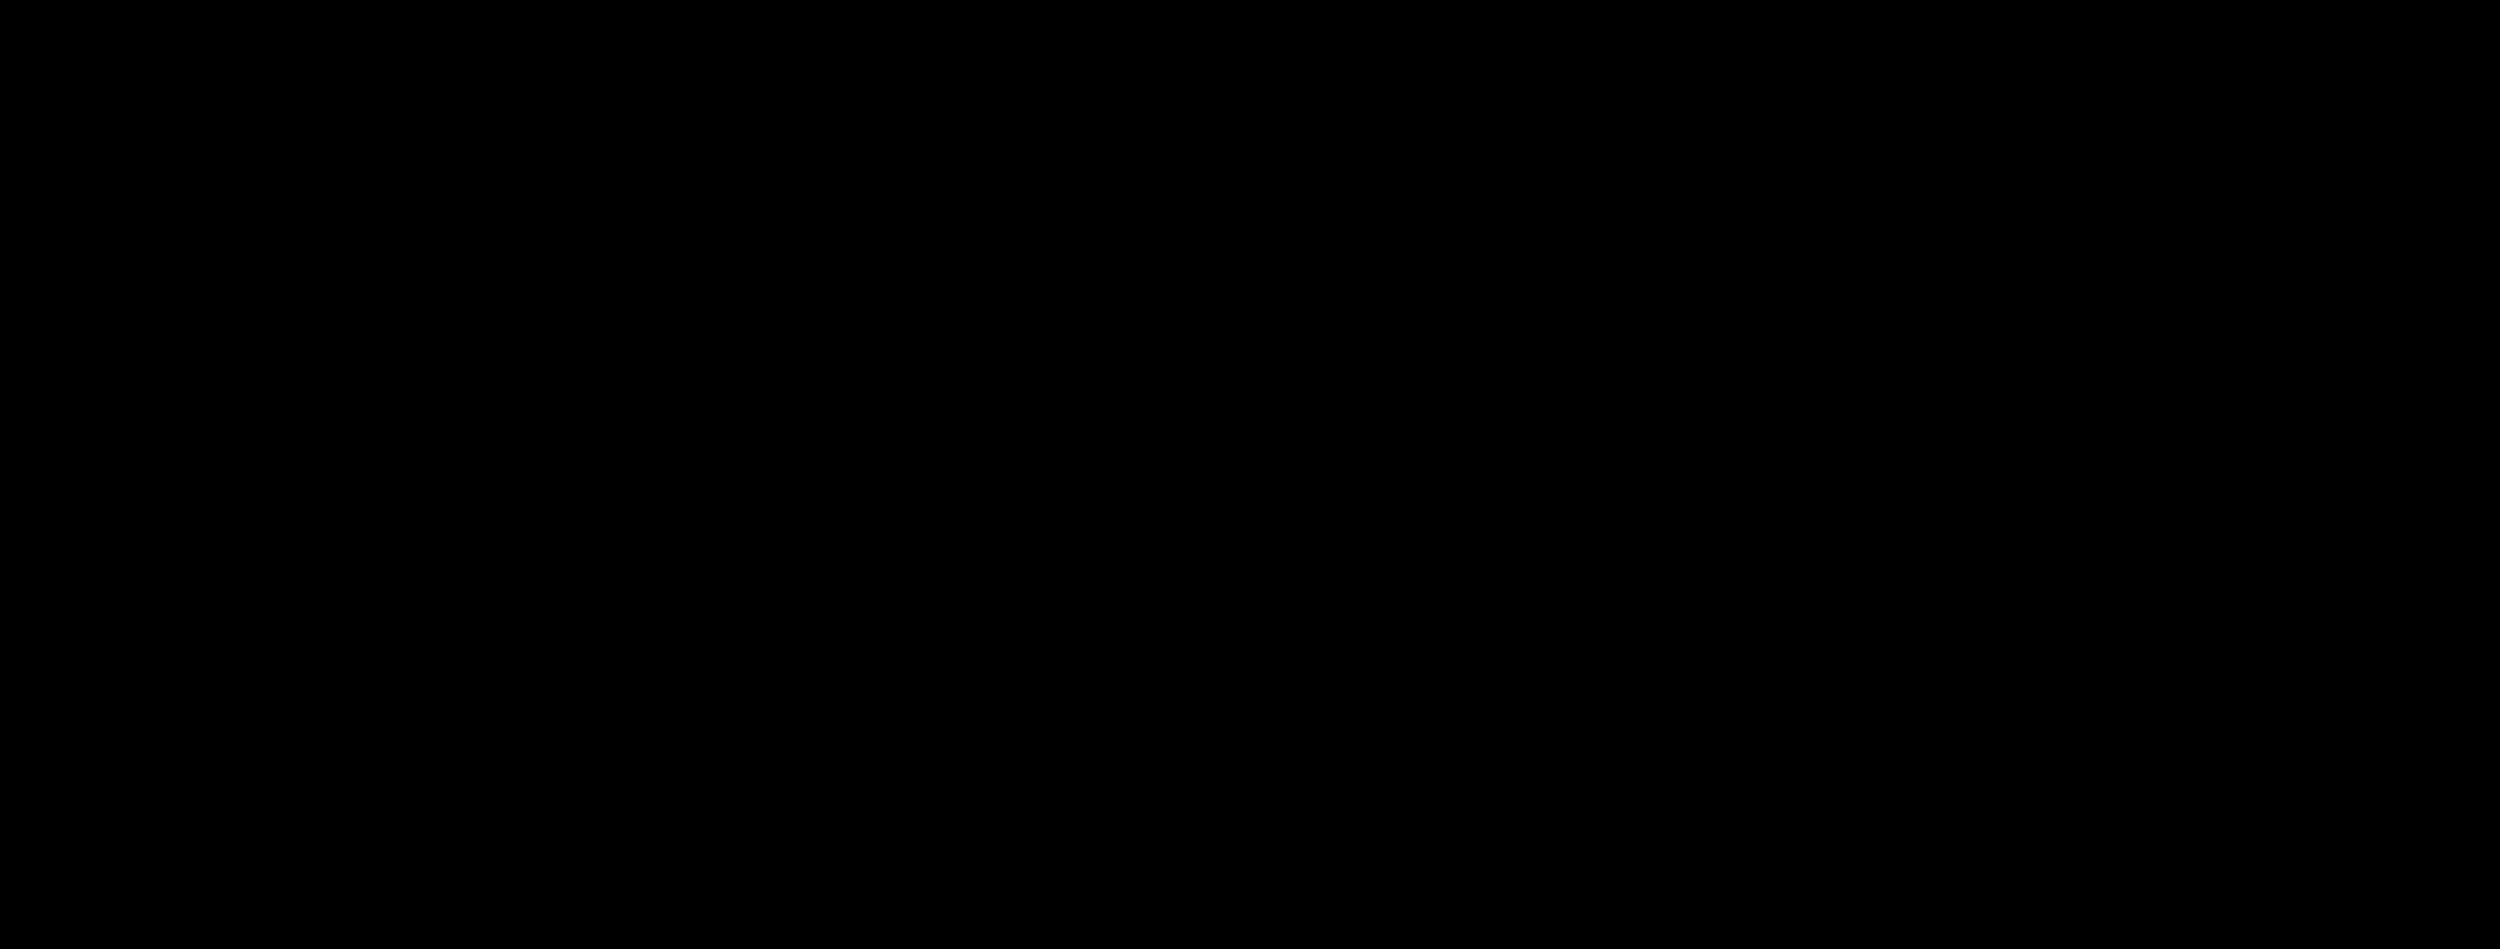 OAS_Logo-2018_OAS Permission Black.png